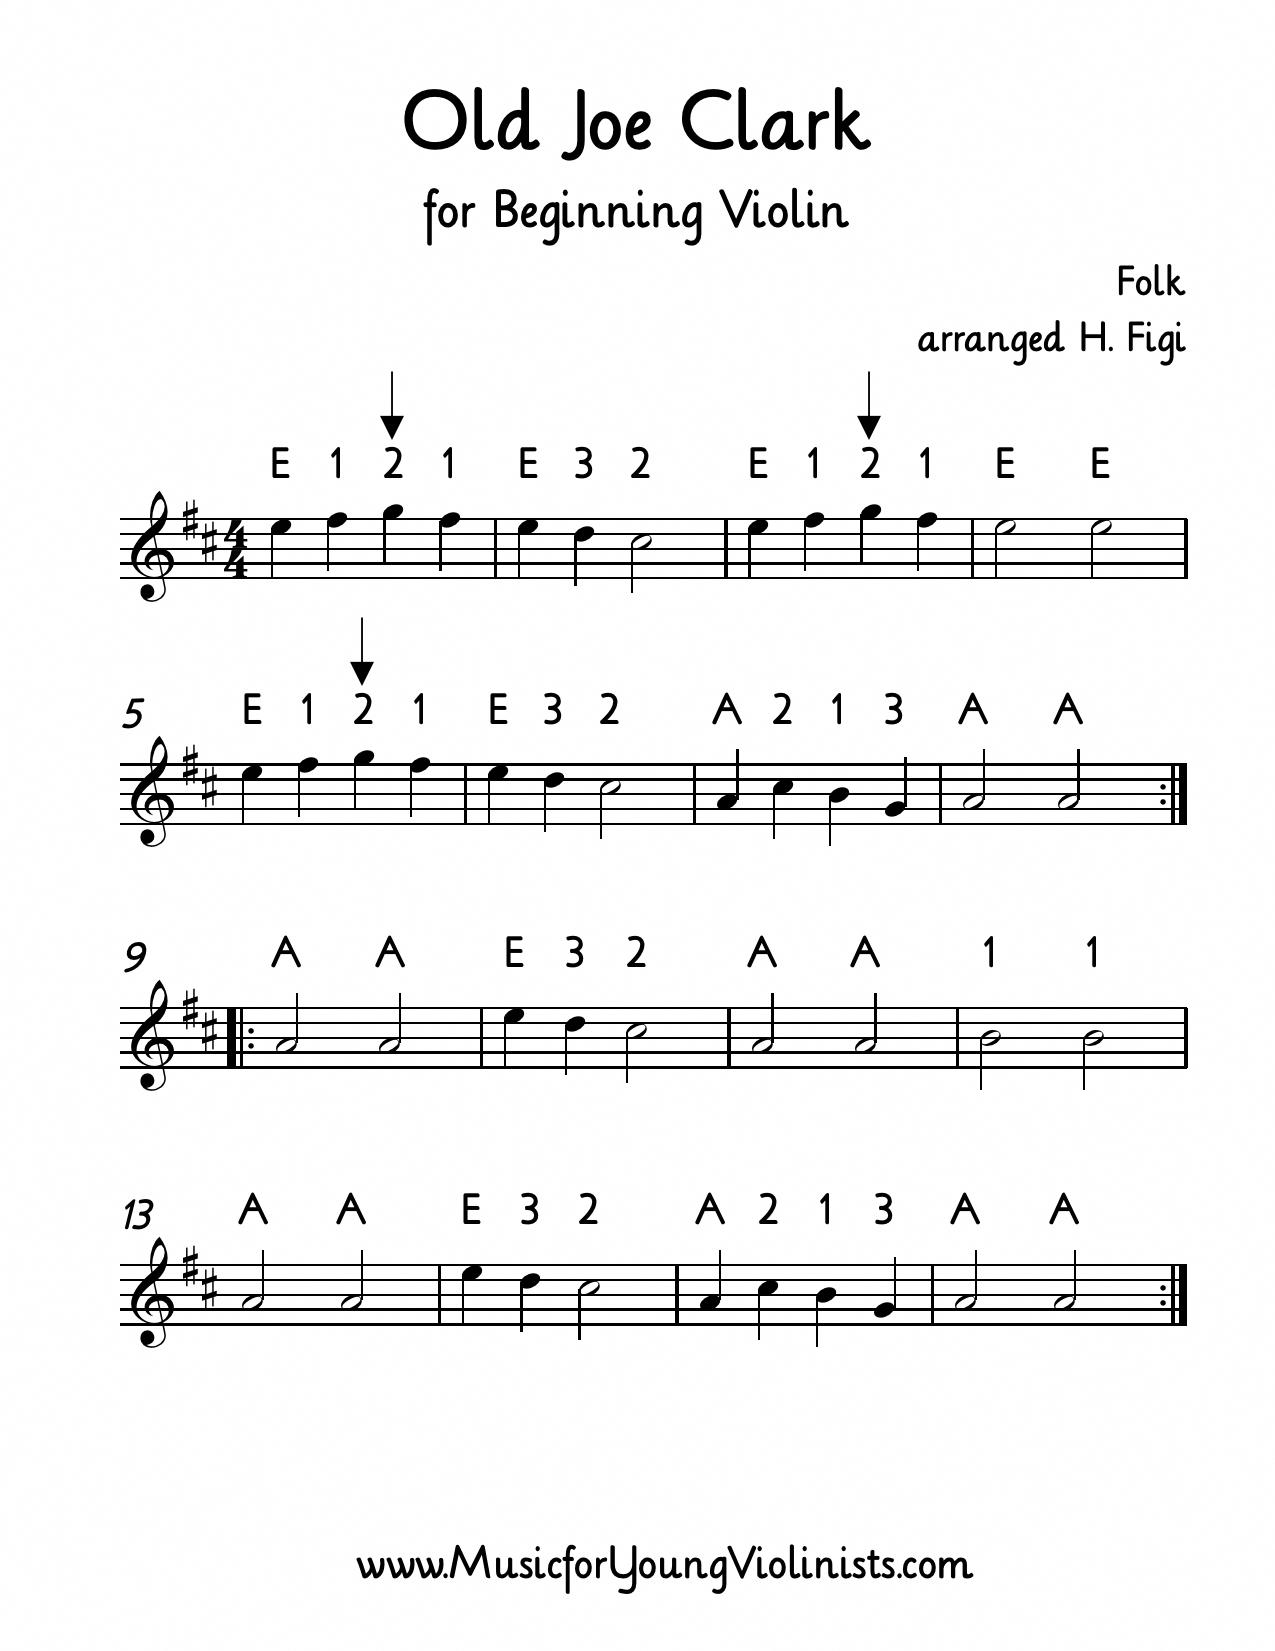 FIDDLE MUSIC: Old Joe Clark for beginning violin (sheet music PDF